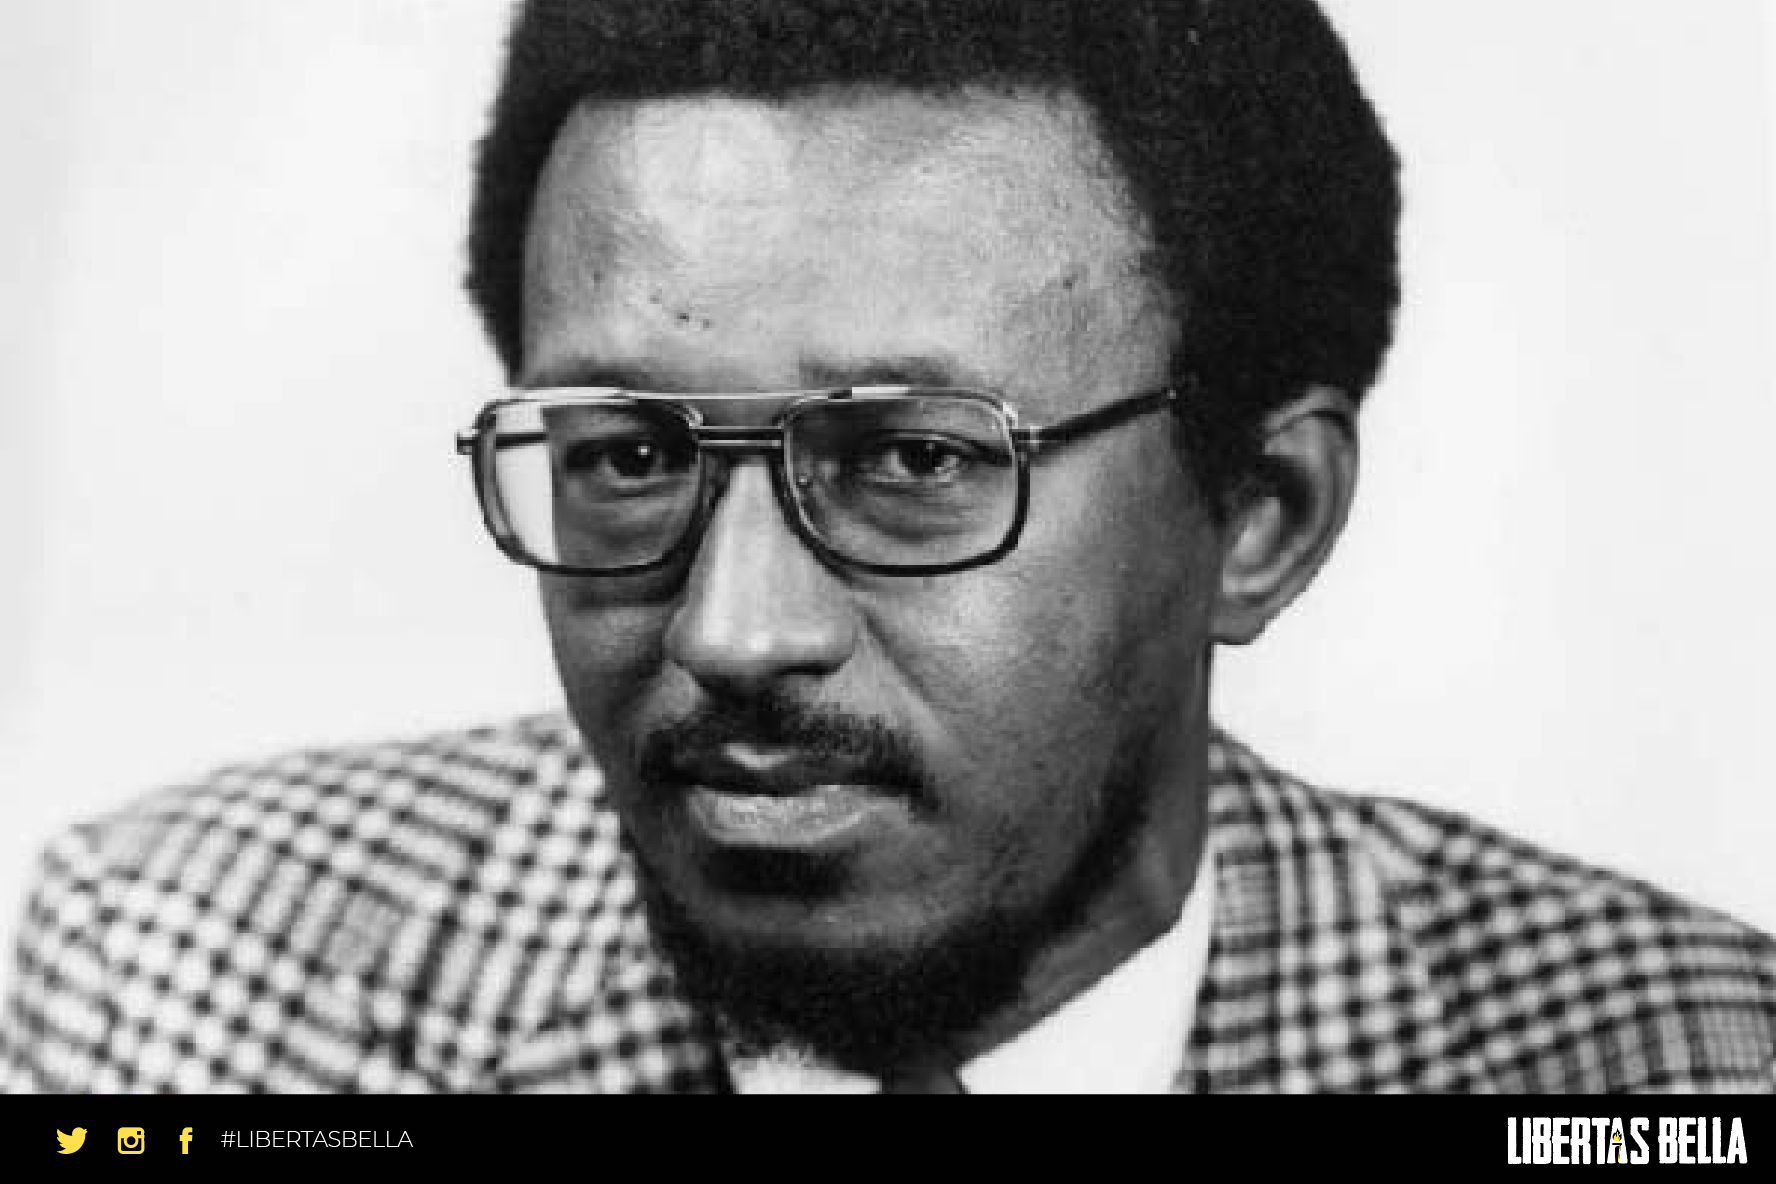 Walter E. Williams Quotes - Walter E. Williams in black and white with glasses